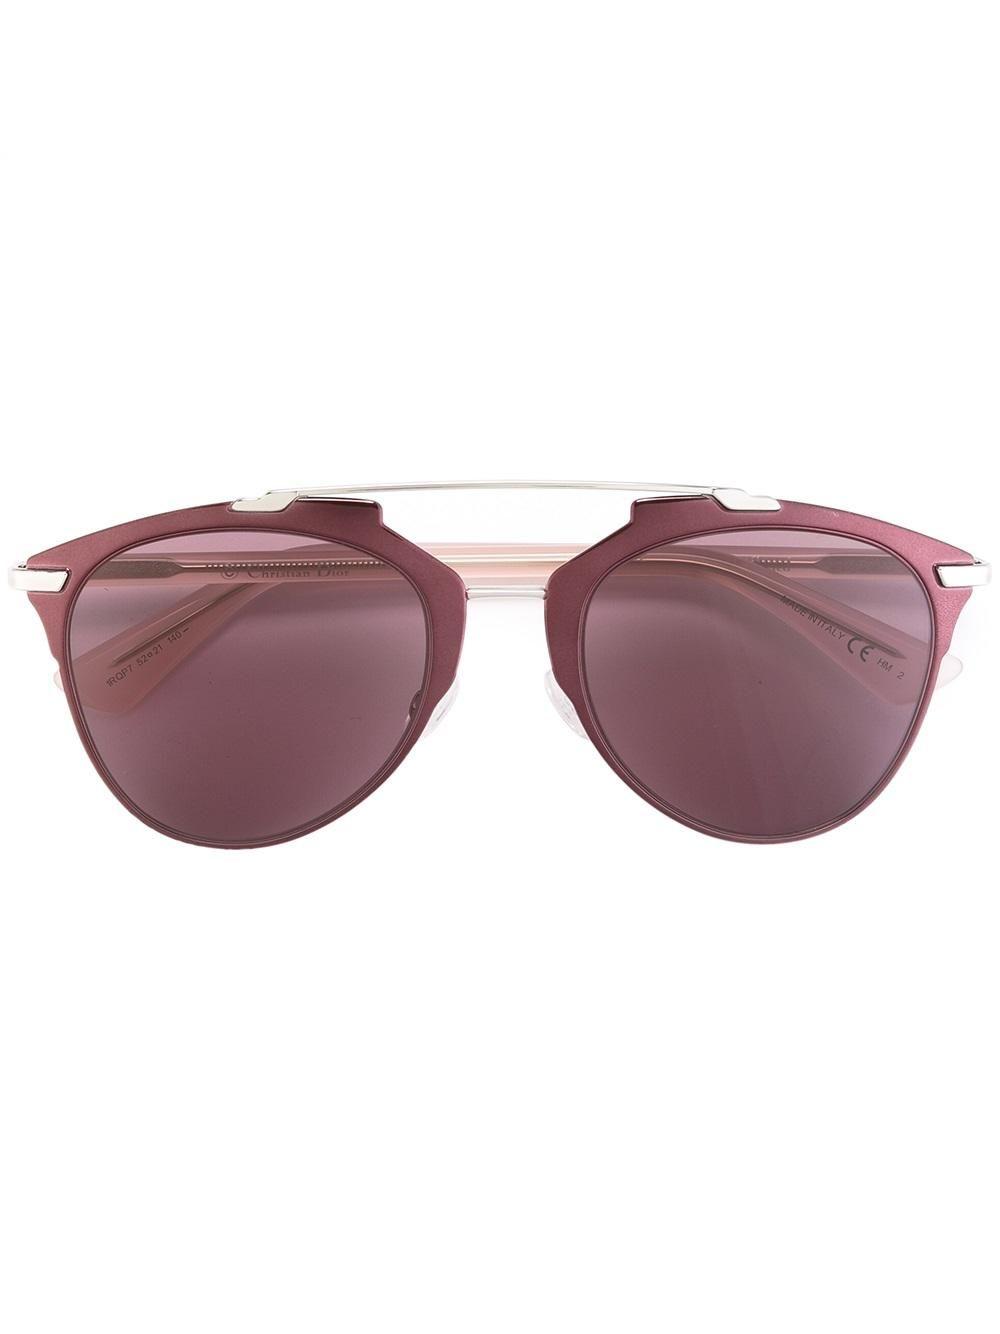 15ff08f1fe11 Pink acetate and metal  Reflected Burgun  sunglasses from Dior Eyewear